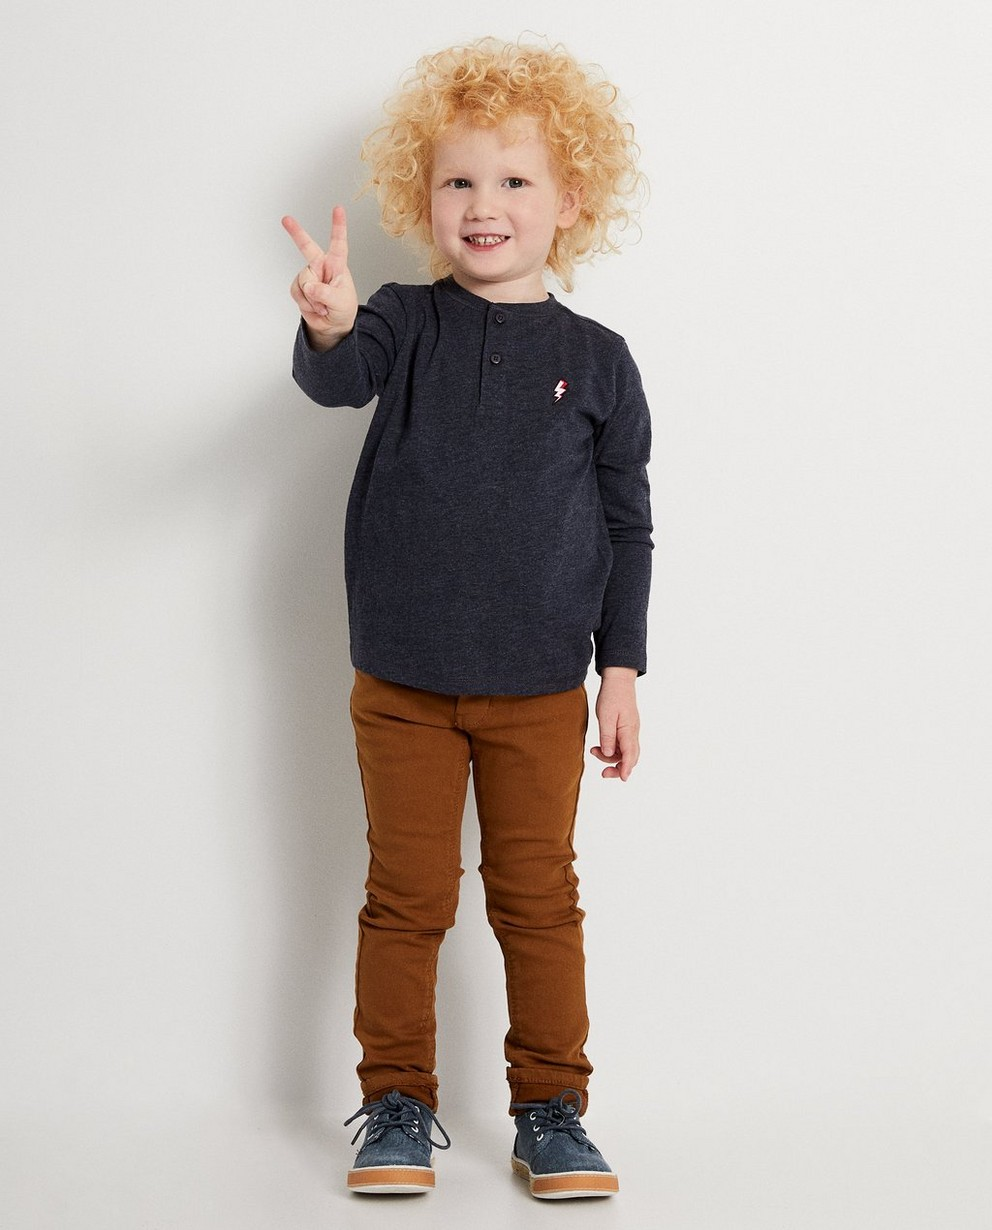 Skinny bleu marine JOEY, 2-7 ans - différents coloris - JBC